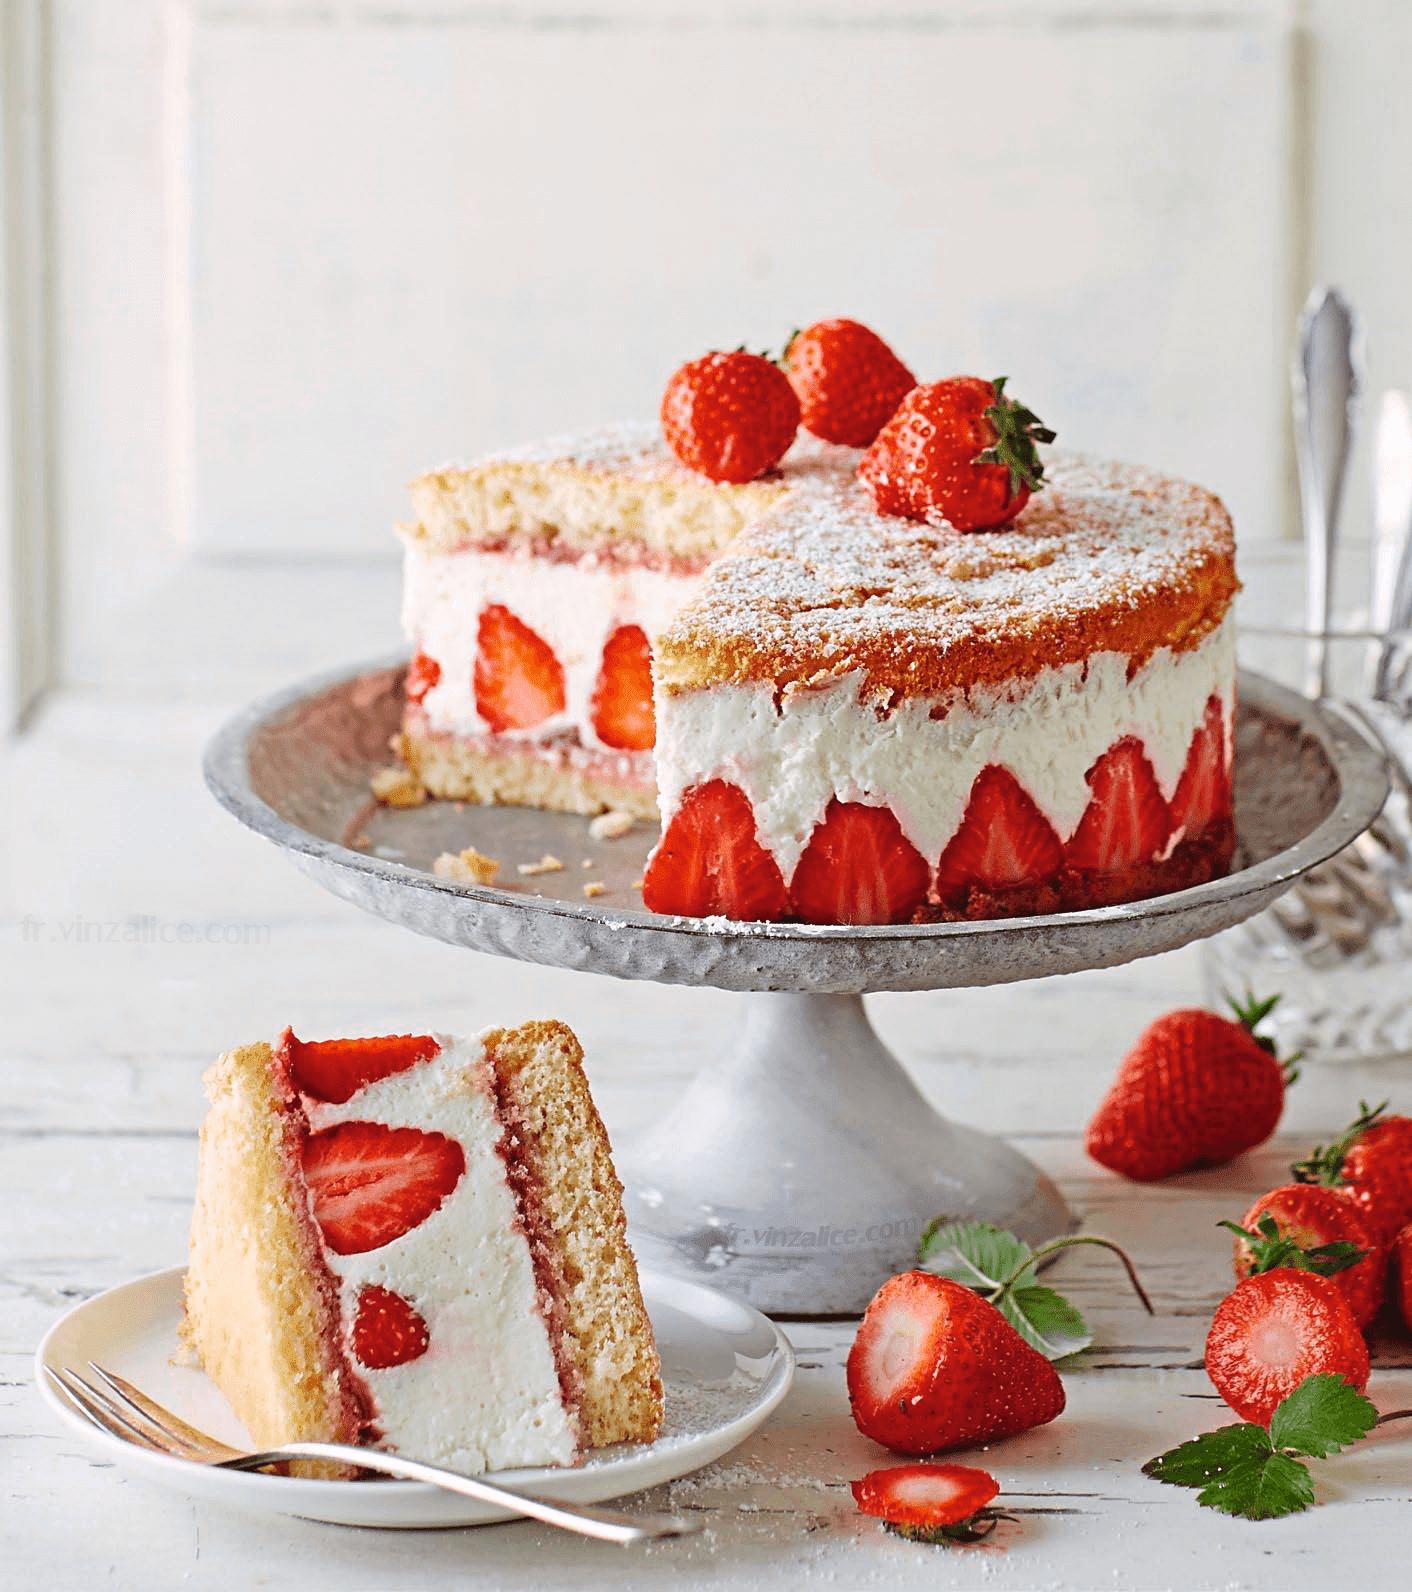 Recette cheesecake fraise-coco facile